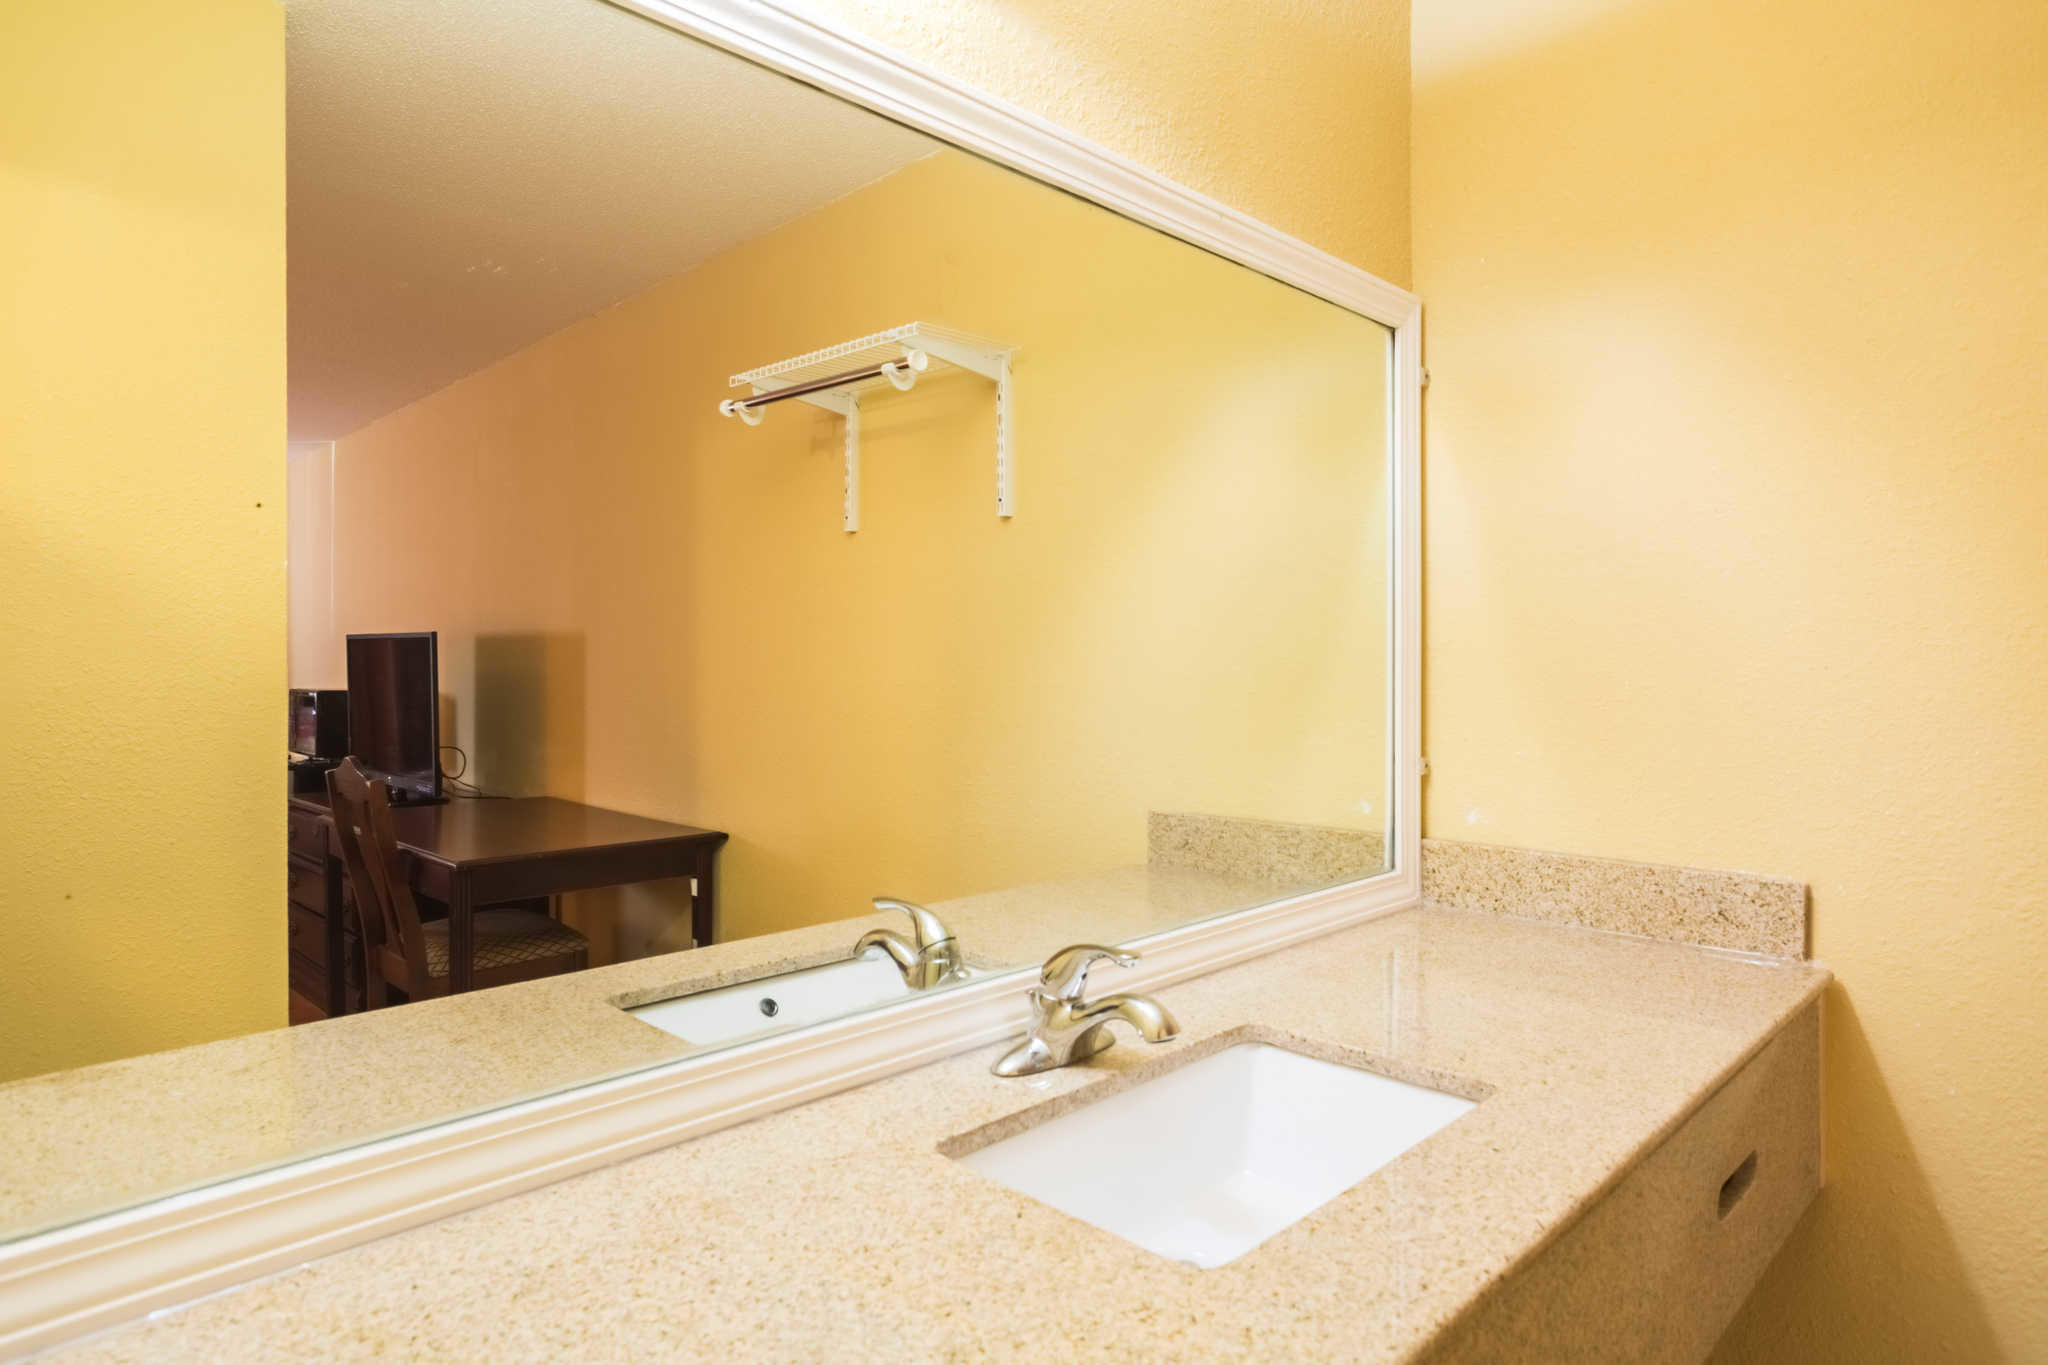 Econo Lodge image 41